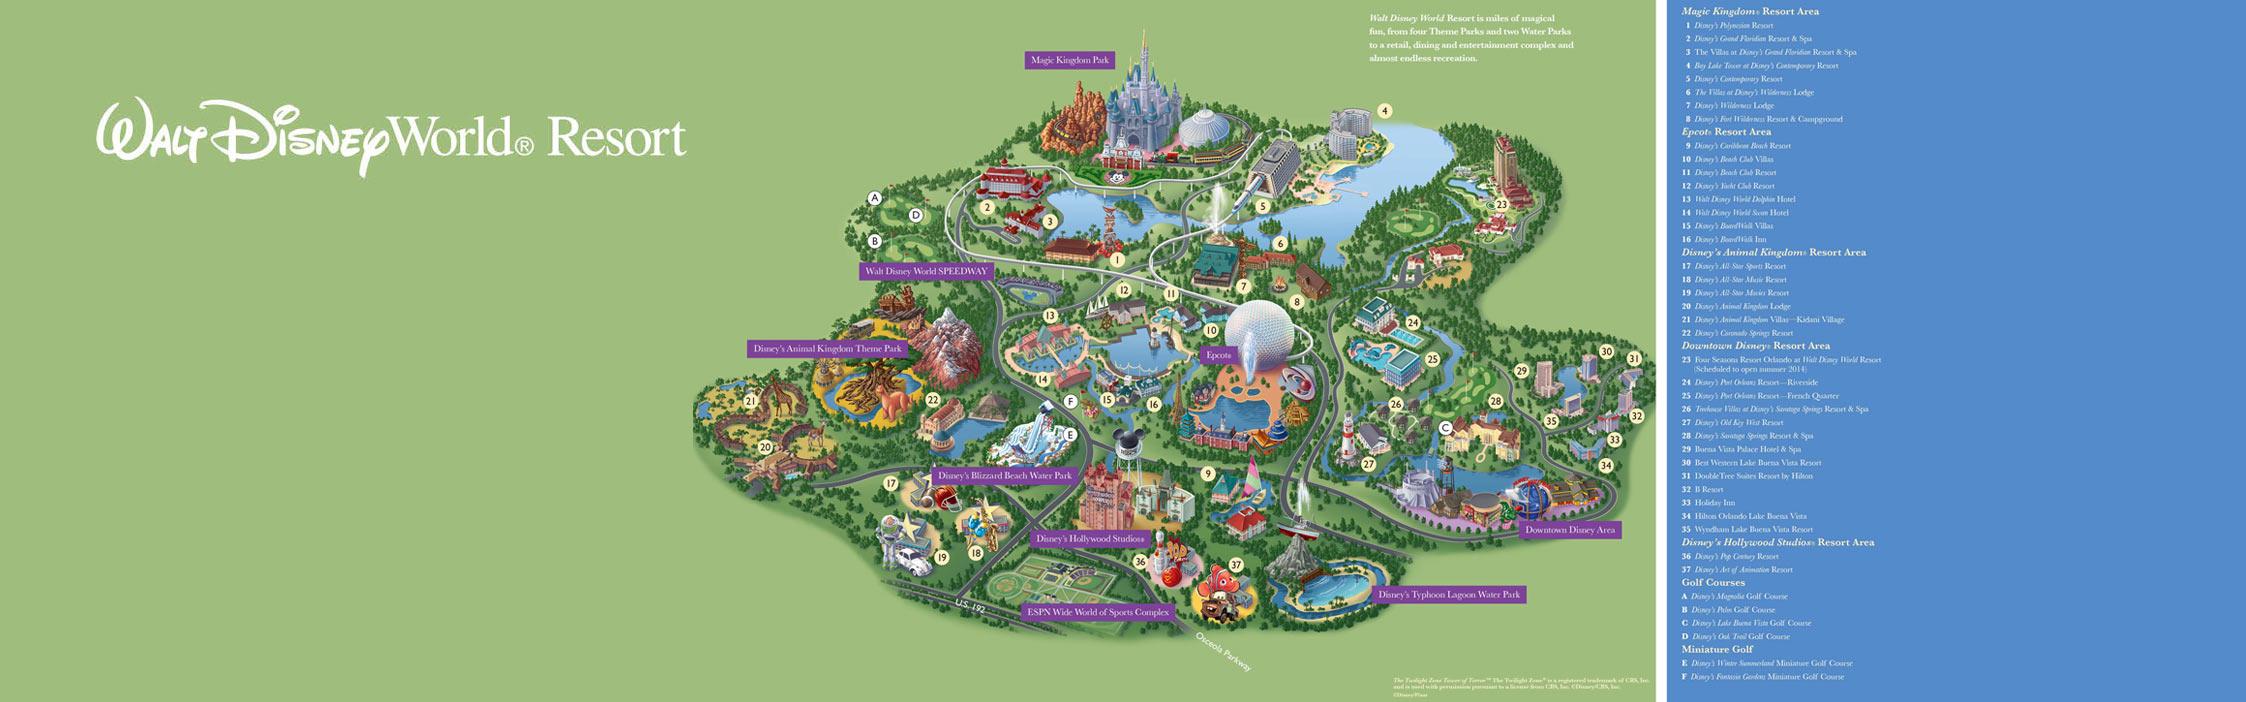 Walt Disney World® Resort Map- Wyndham Lake Buena Vista - Hotel Near - Disney Springs Florida Map